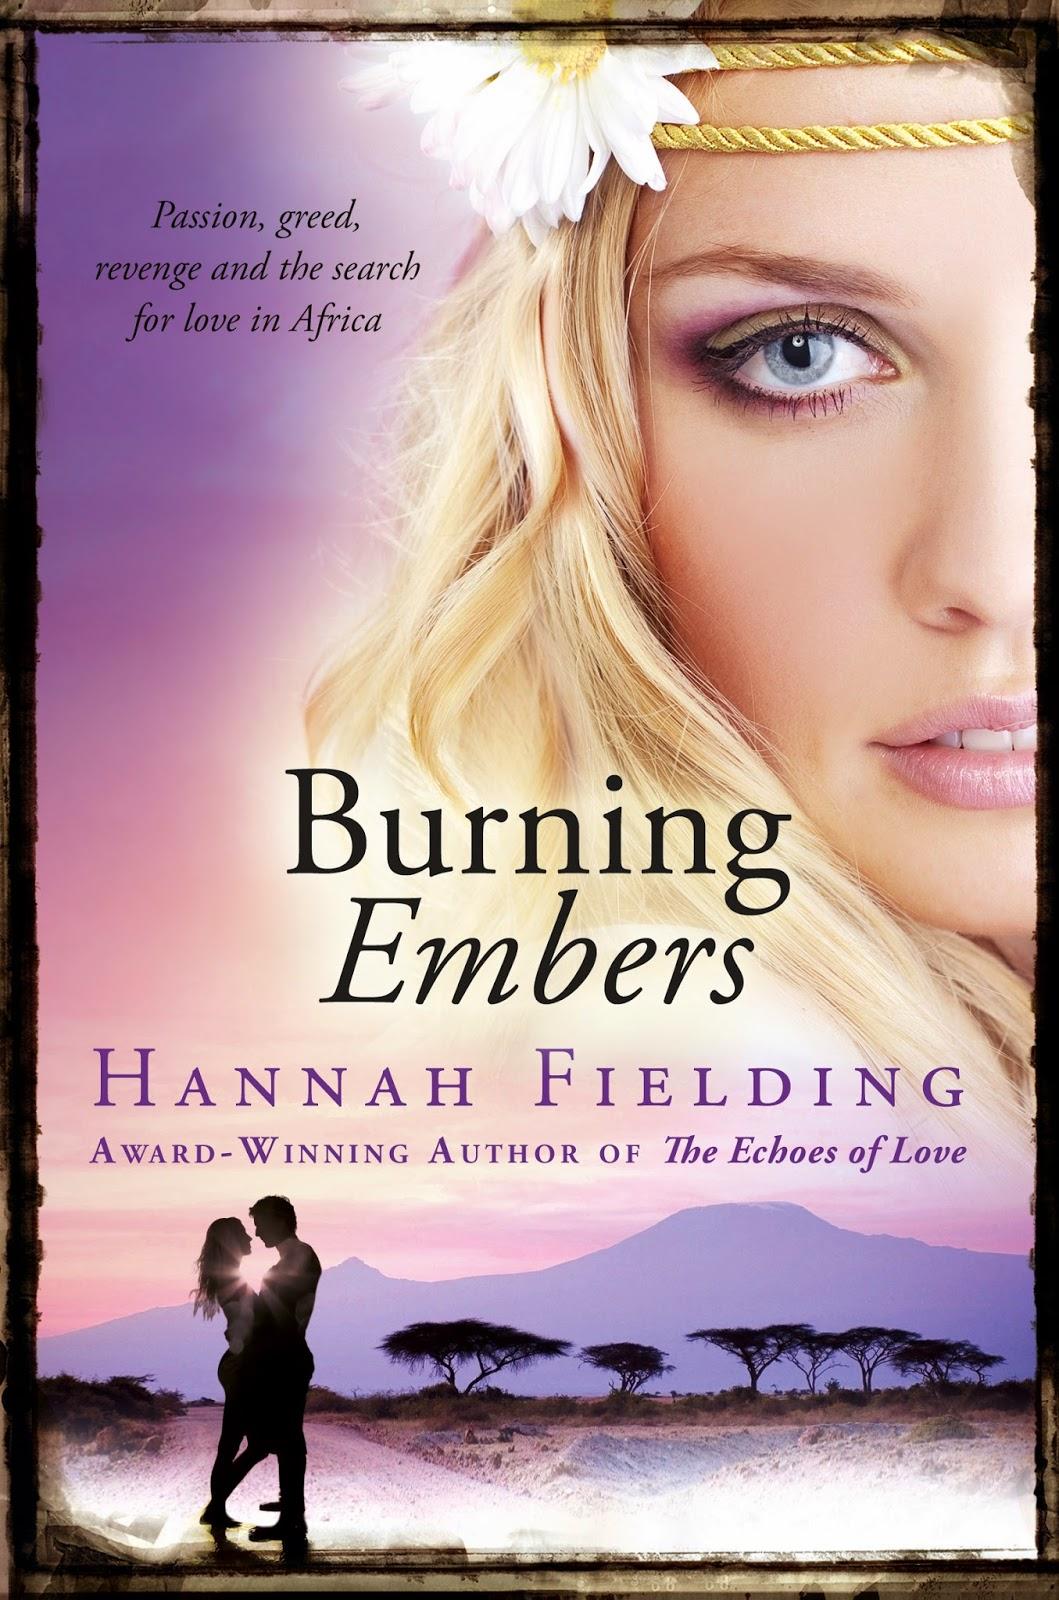 Burning Embers by Hannah Fielding